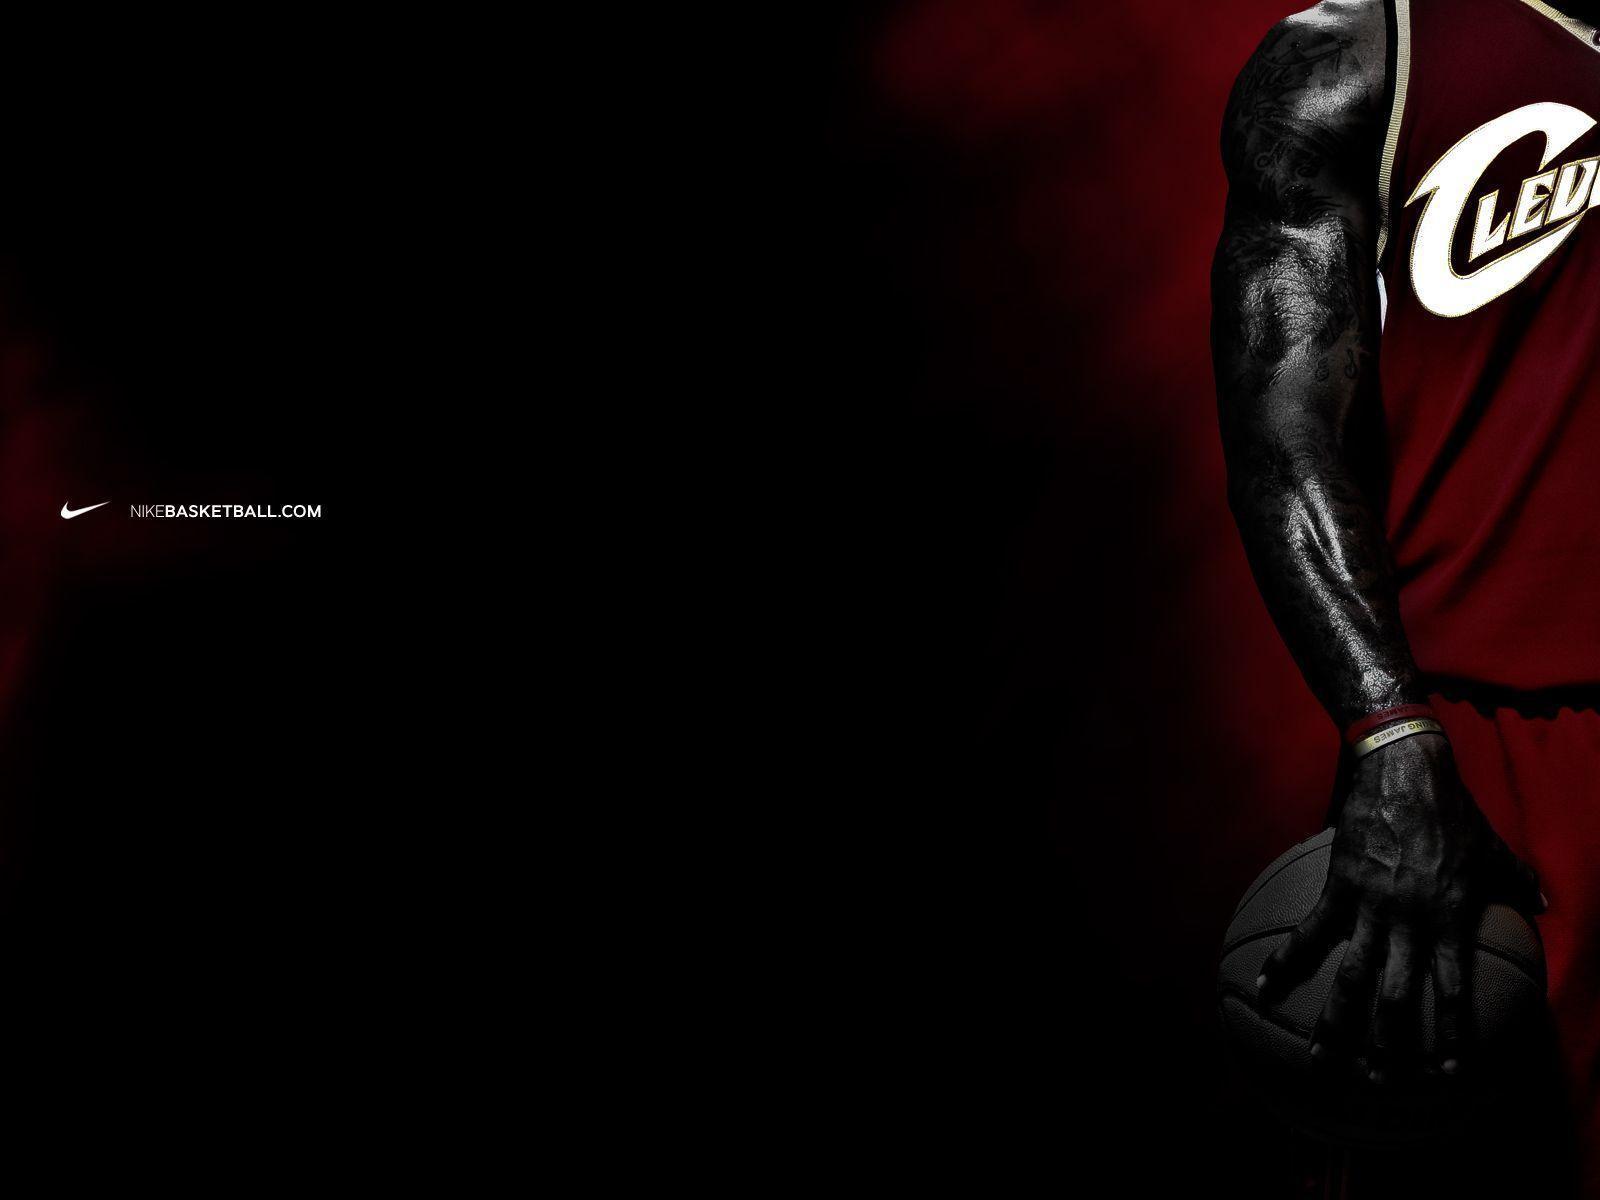 Lebron James Nike Logo Wallpaper